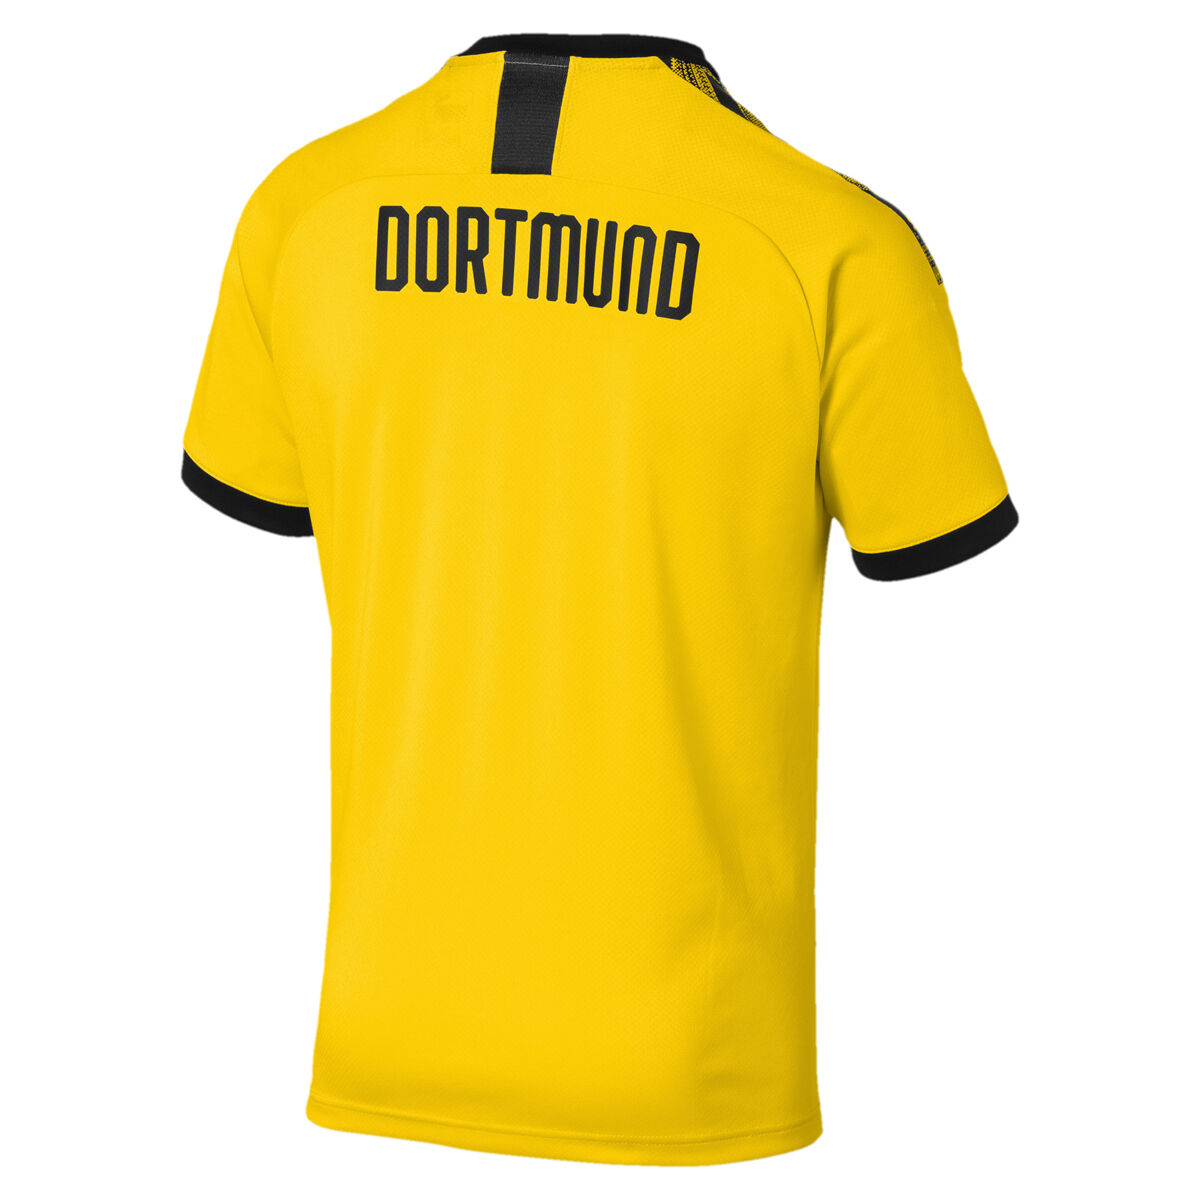 Polo 12-13 Borussia Dortmund Polo Shirt Black S Sport e tempo libero